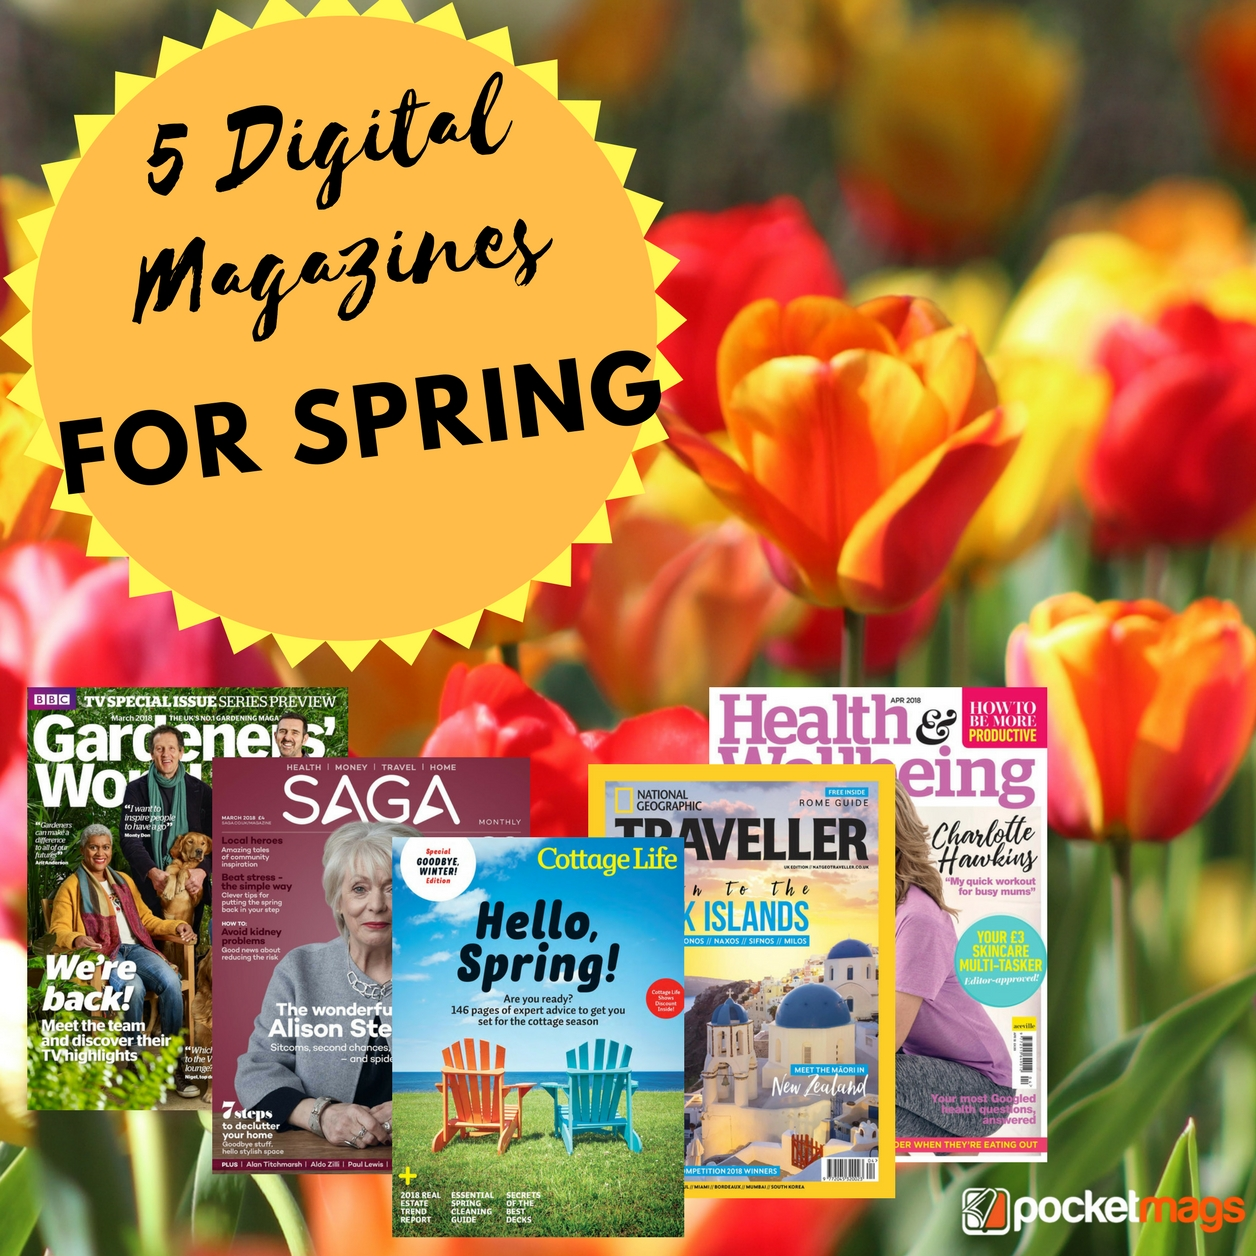 5 Digital Magazines for Spring